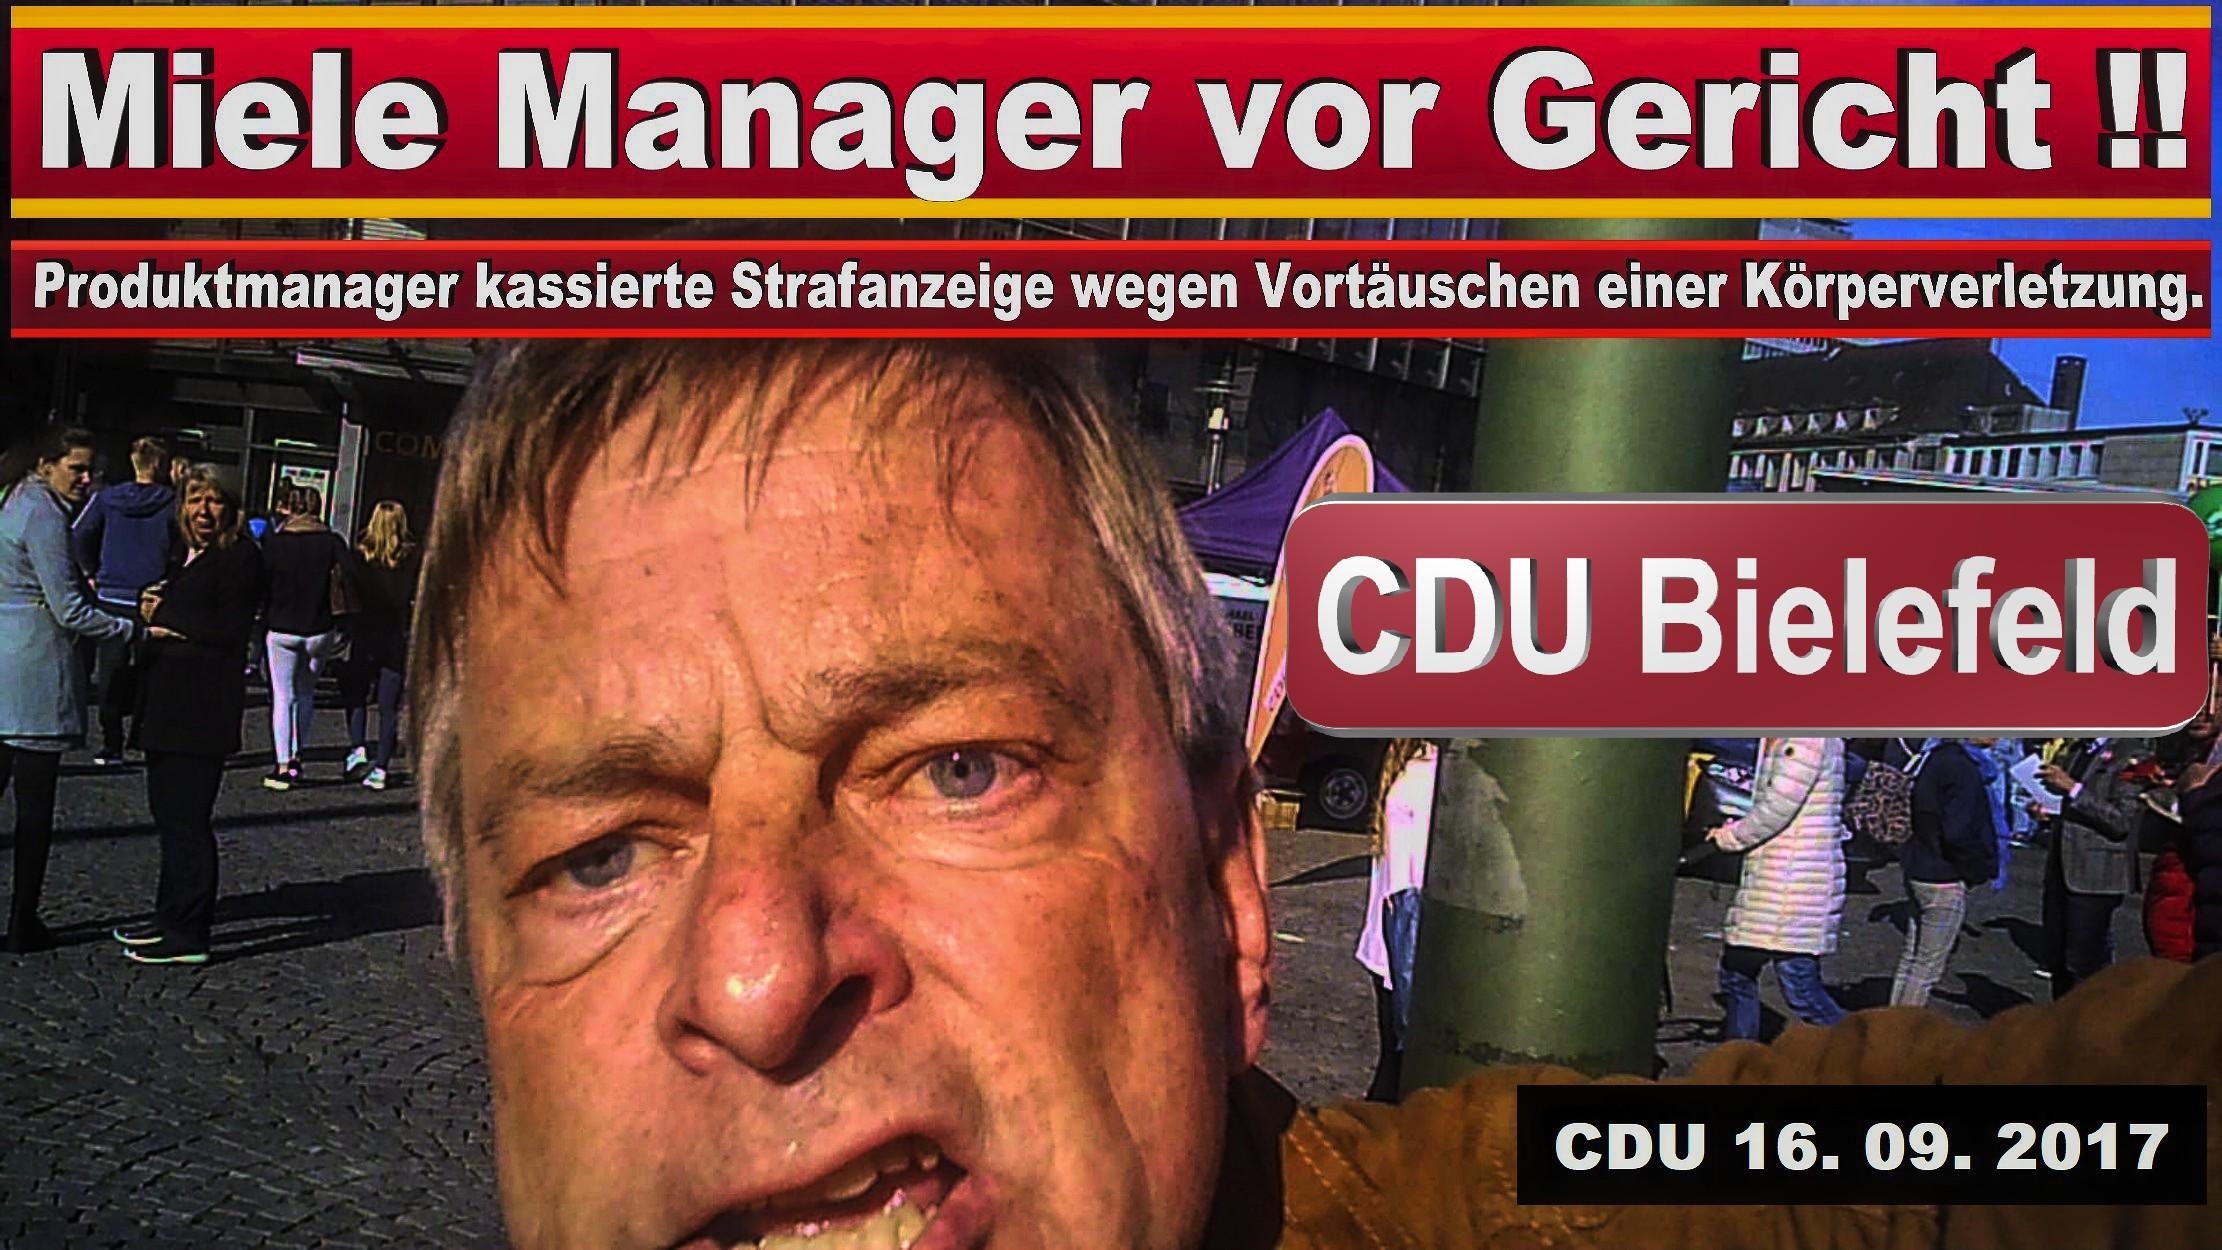 CDU BIELEFELD MITTE MICHAEL WEBER MIELE GüTERSLOH PRODUKTMANAGER JURIST SPD FDP AFD BIELEFELD